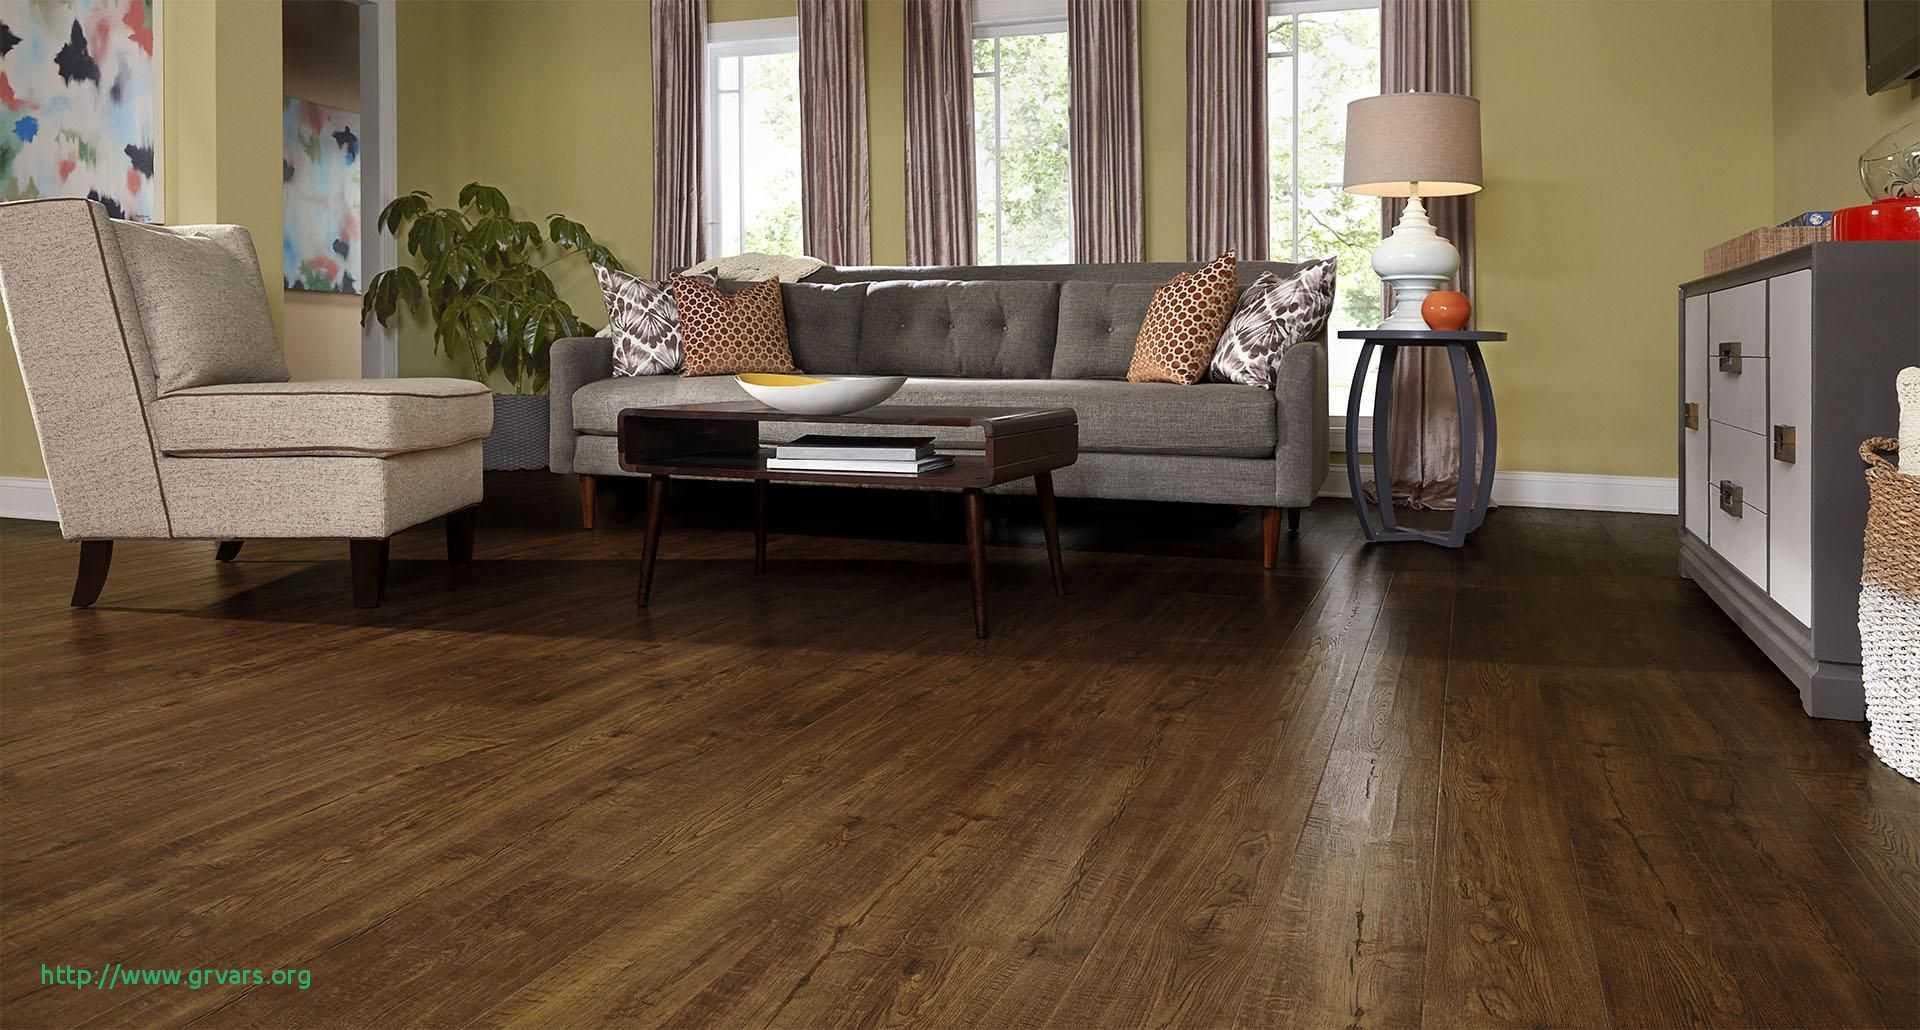 mohawk white oak hardwood flooring of how to ideas blog part 3 inside 21 inspirant how to install pergo laminate flooring video